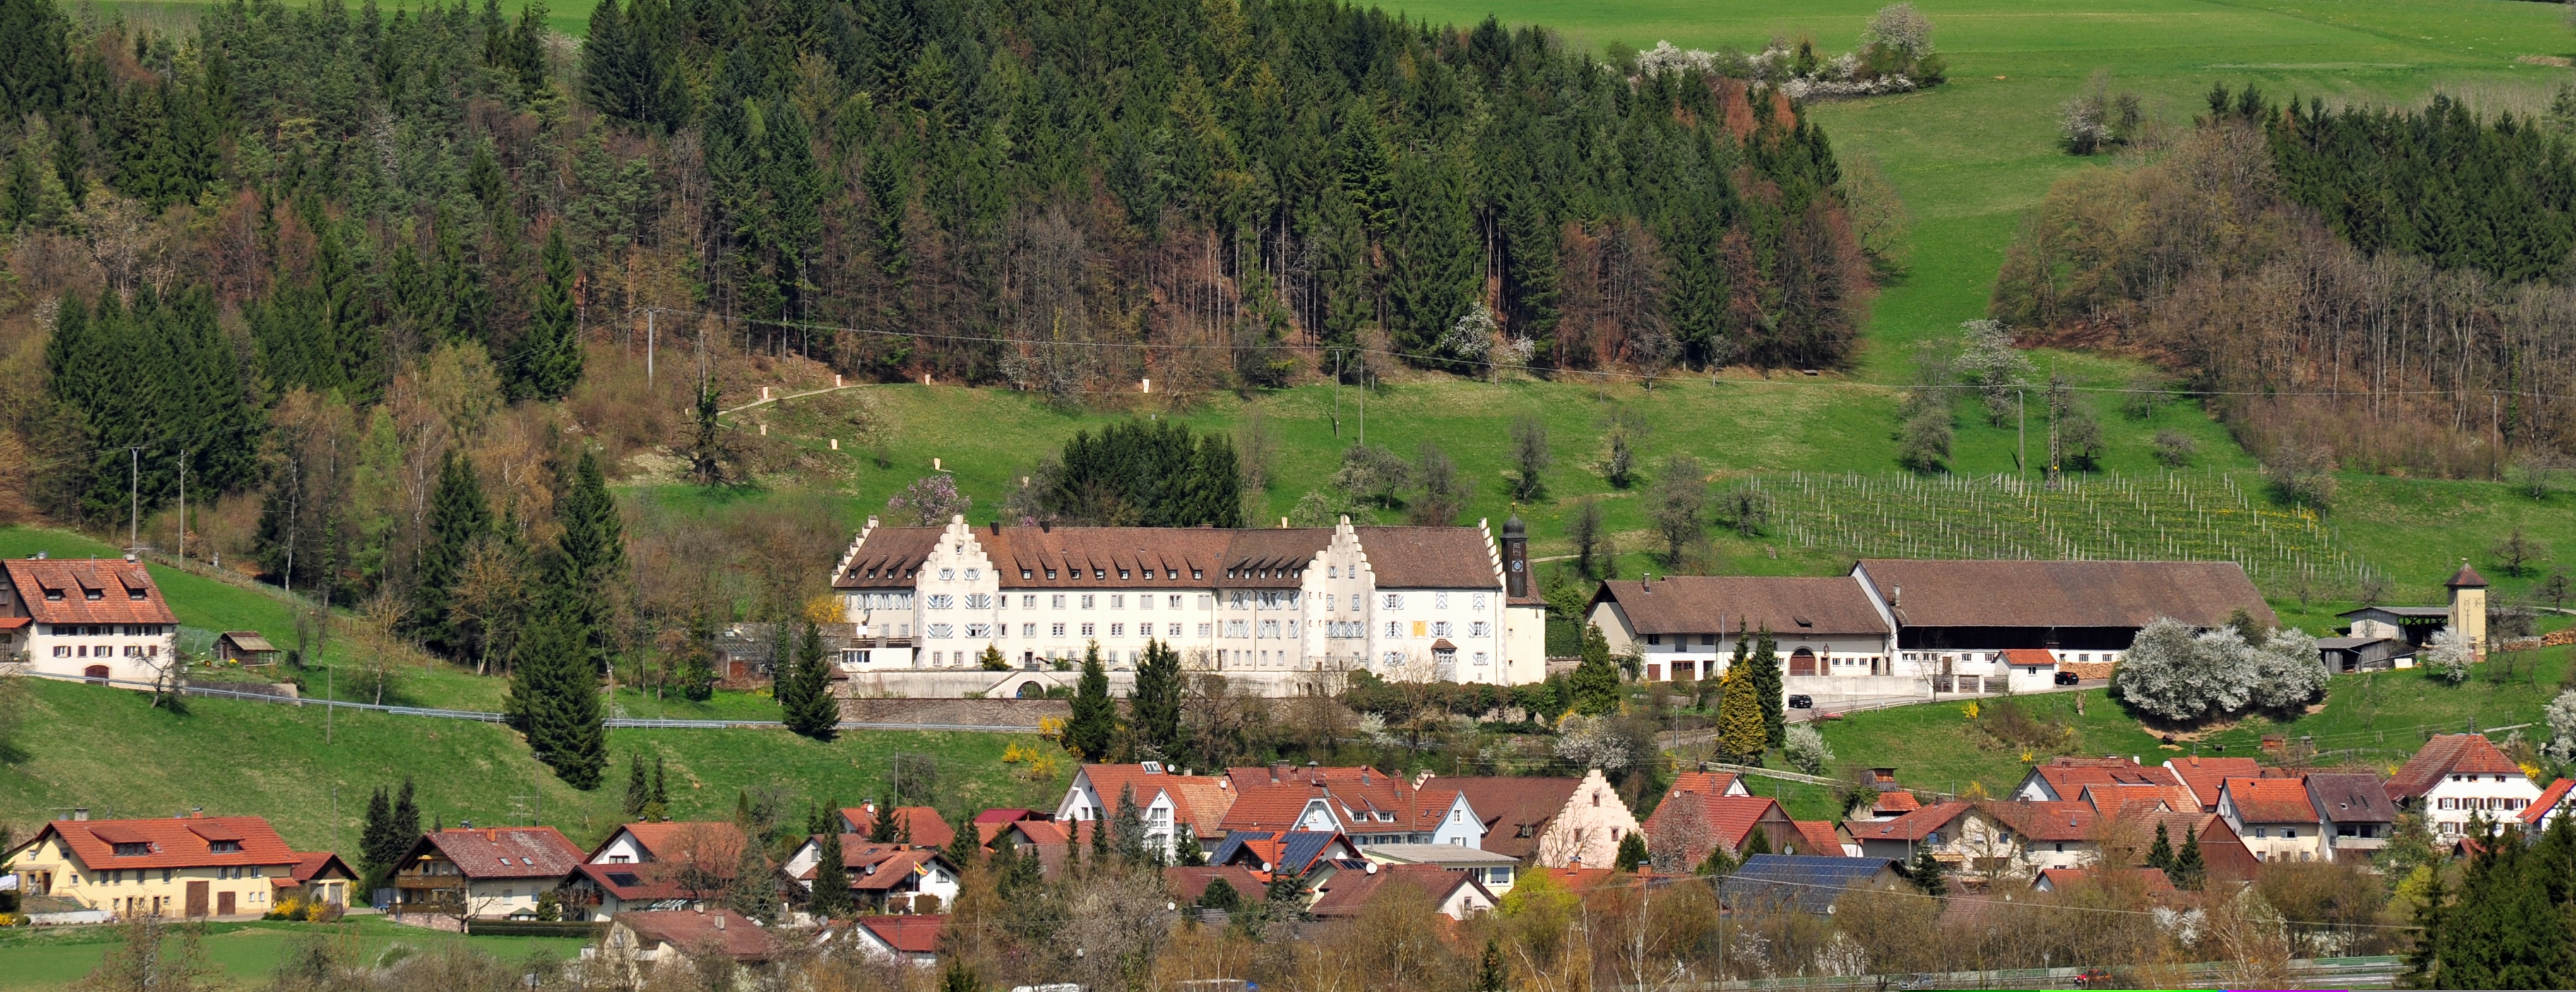 Kloser Marienburg bei Ofteringen